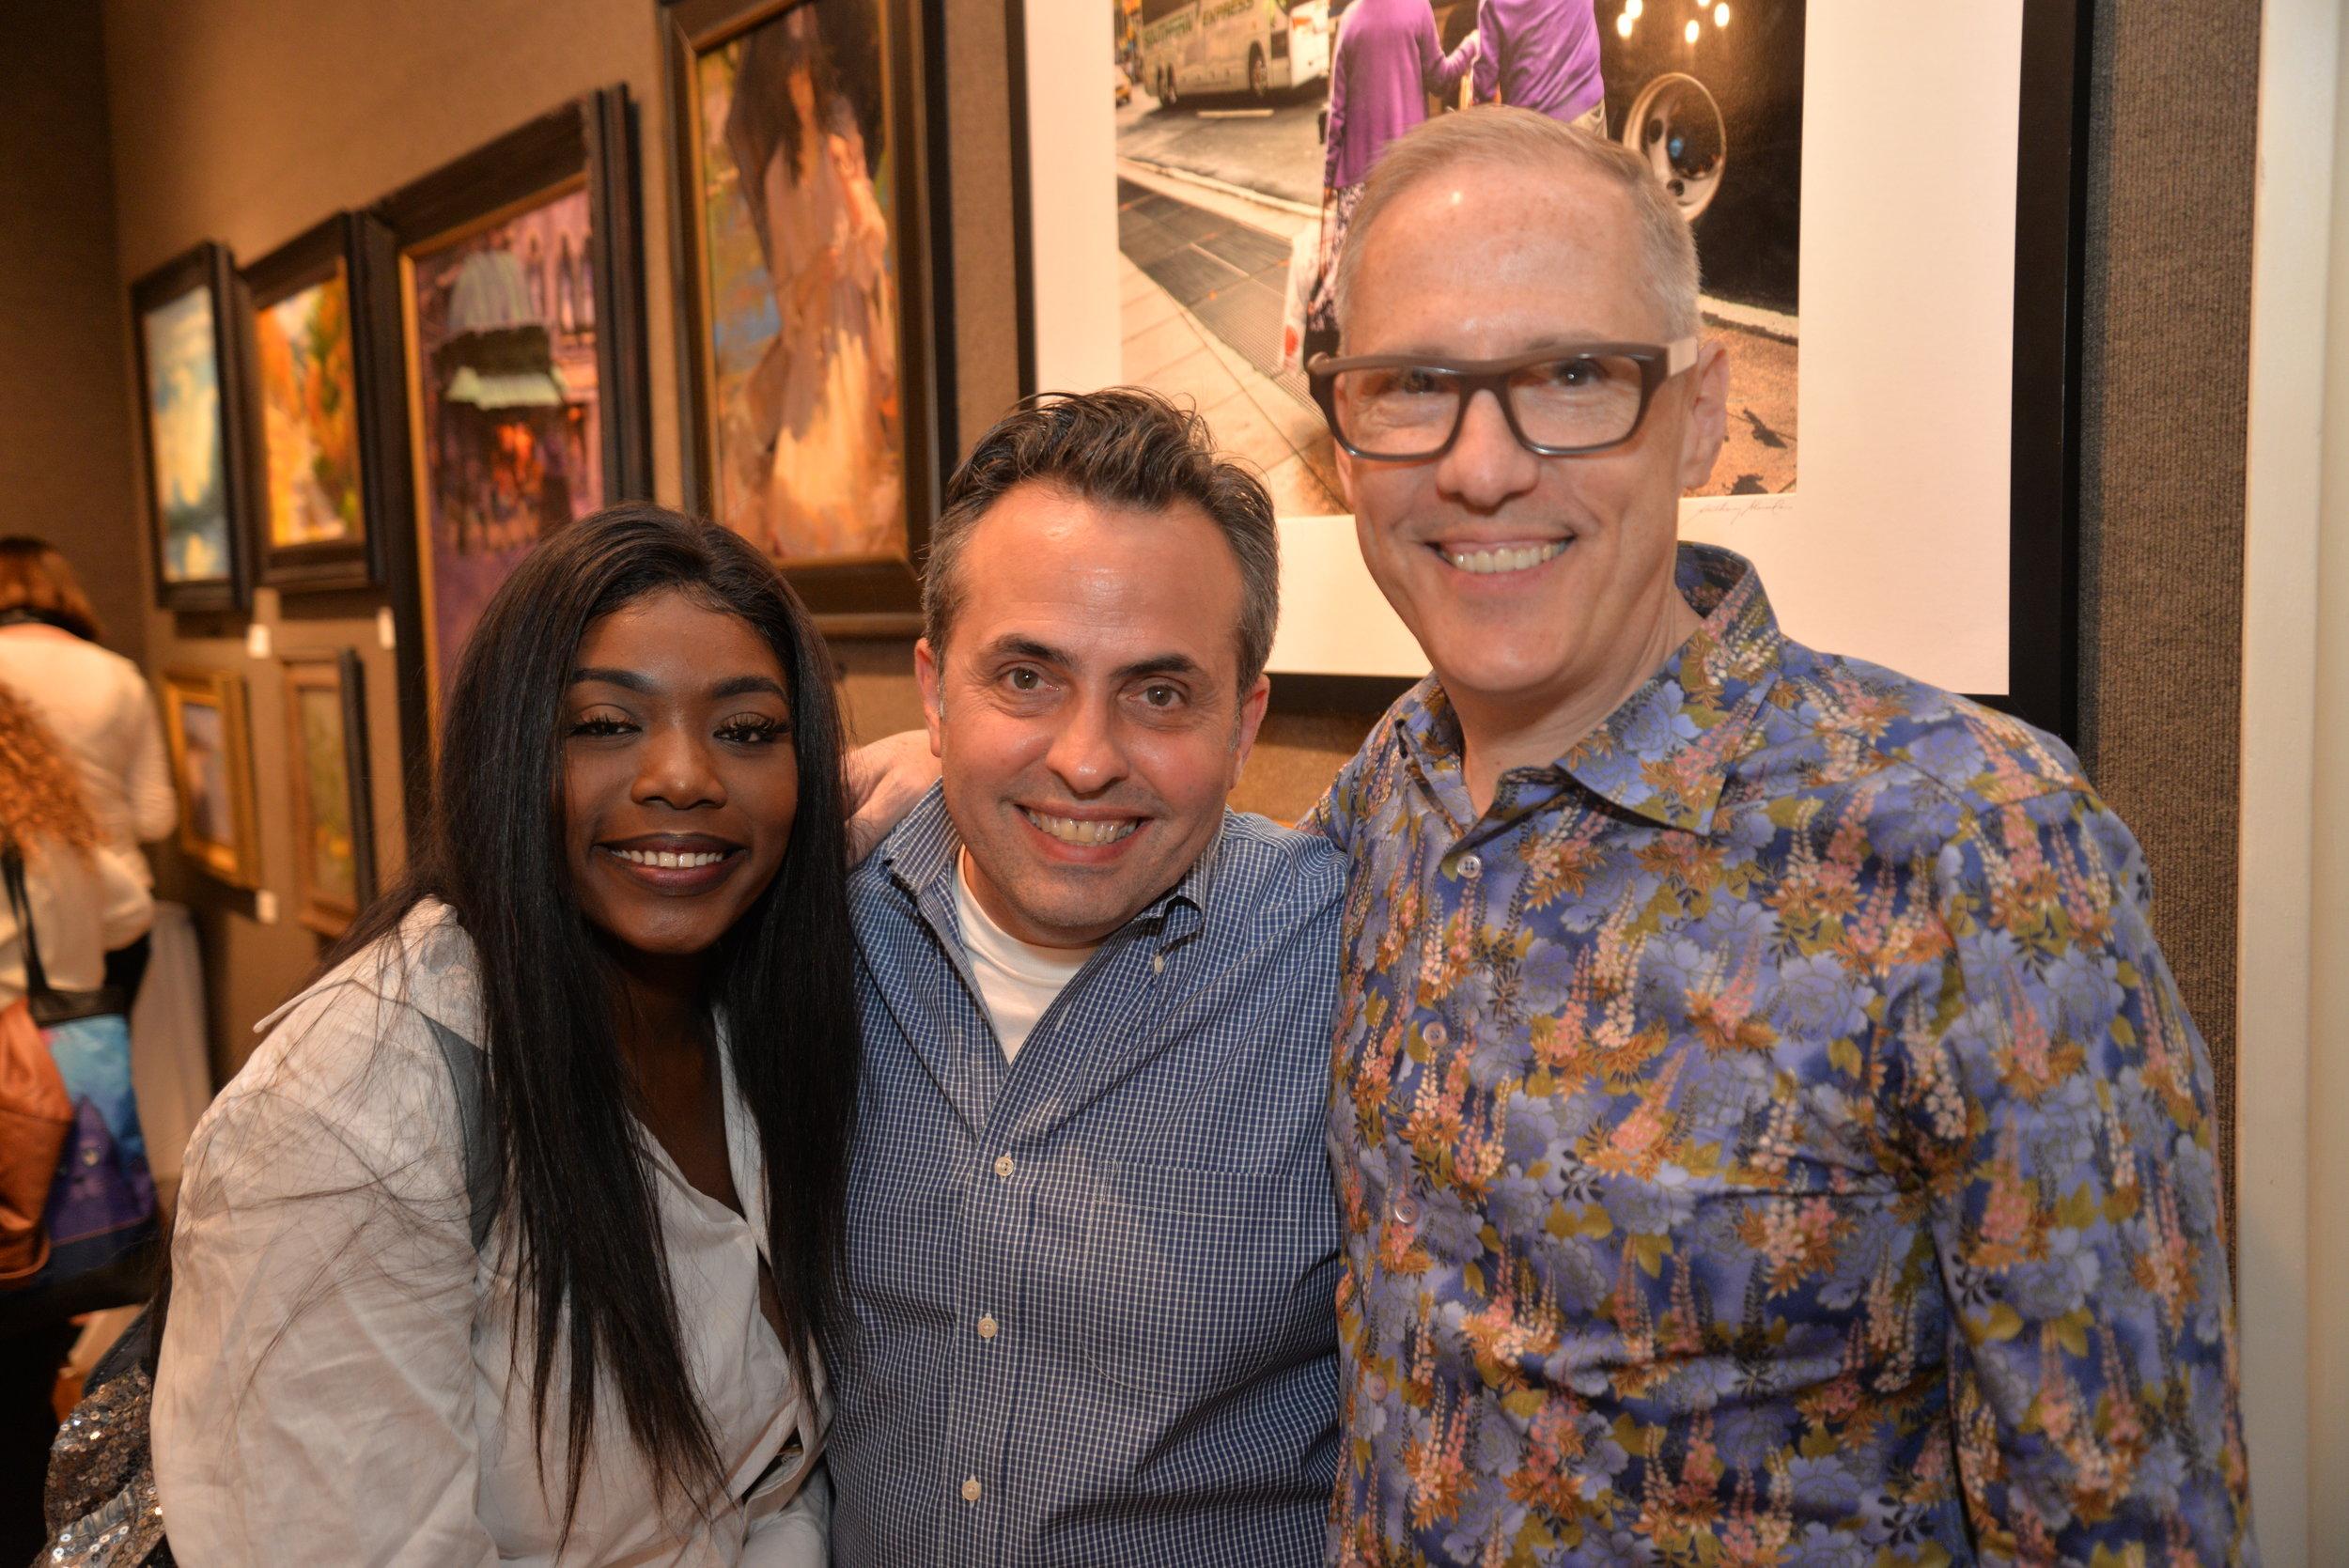 Lekiyrah, Kendall Messick, & Paul Lucas